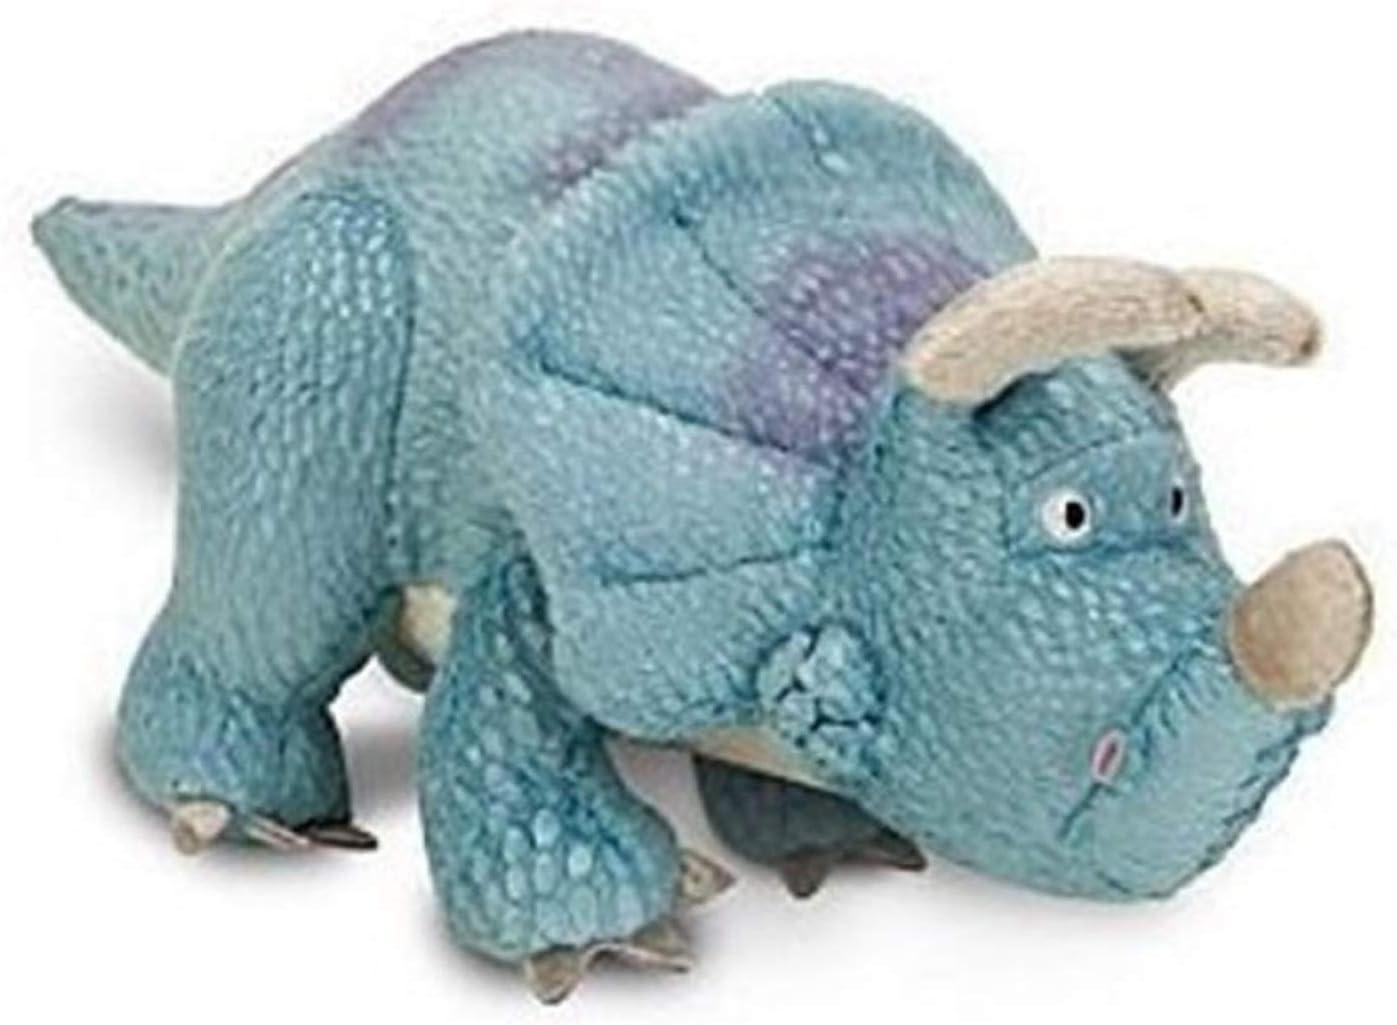 YRCBQJBE Ranking TOP17 Max 82% OFF Blue Triceratops Dinosaur Stuffed Animal Plush Toy